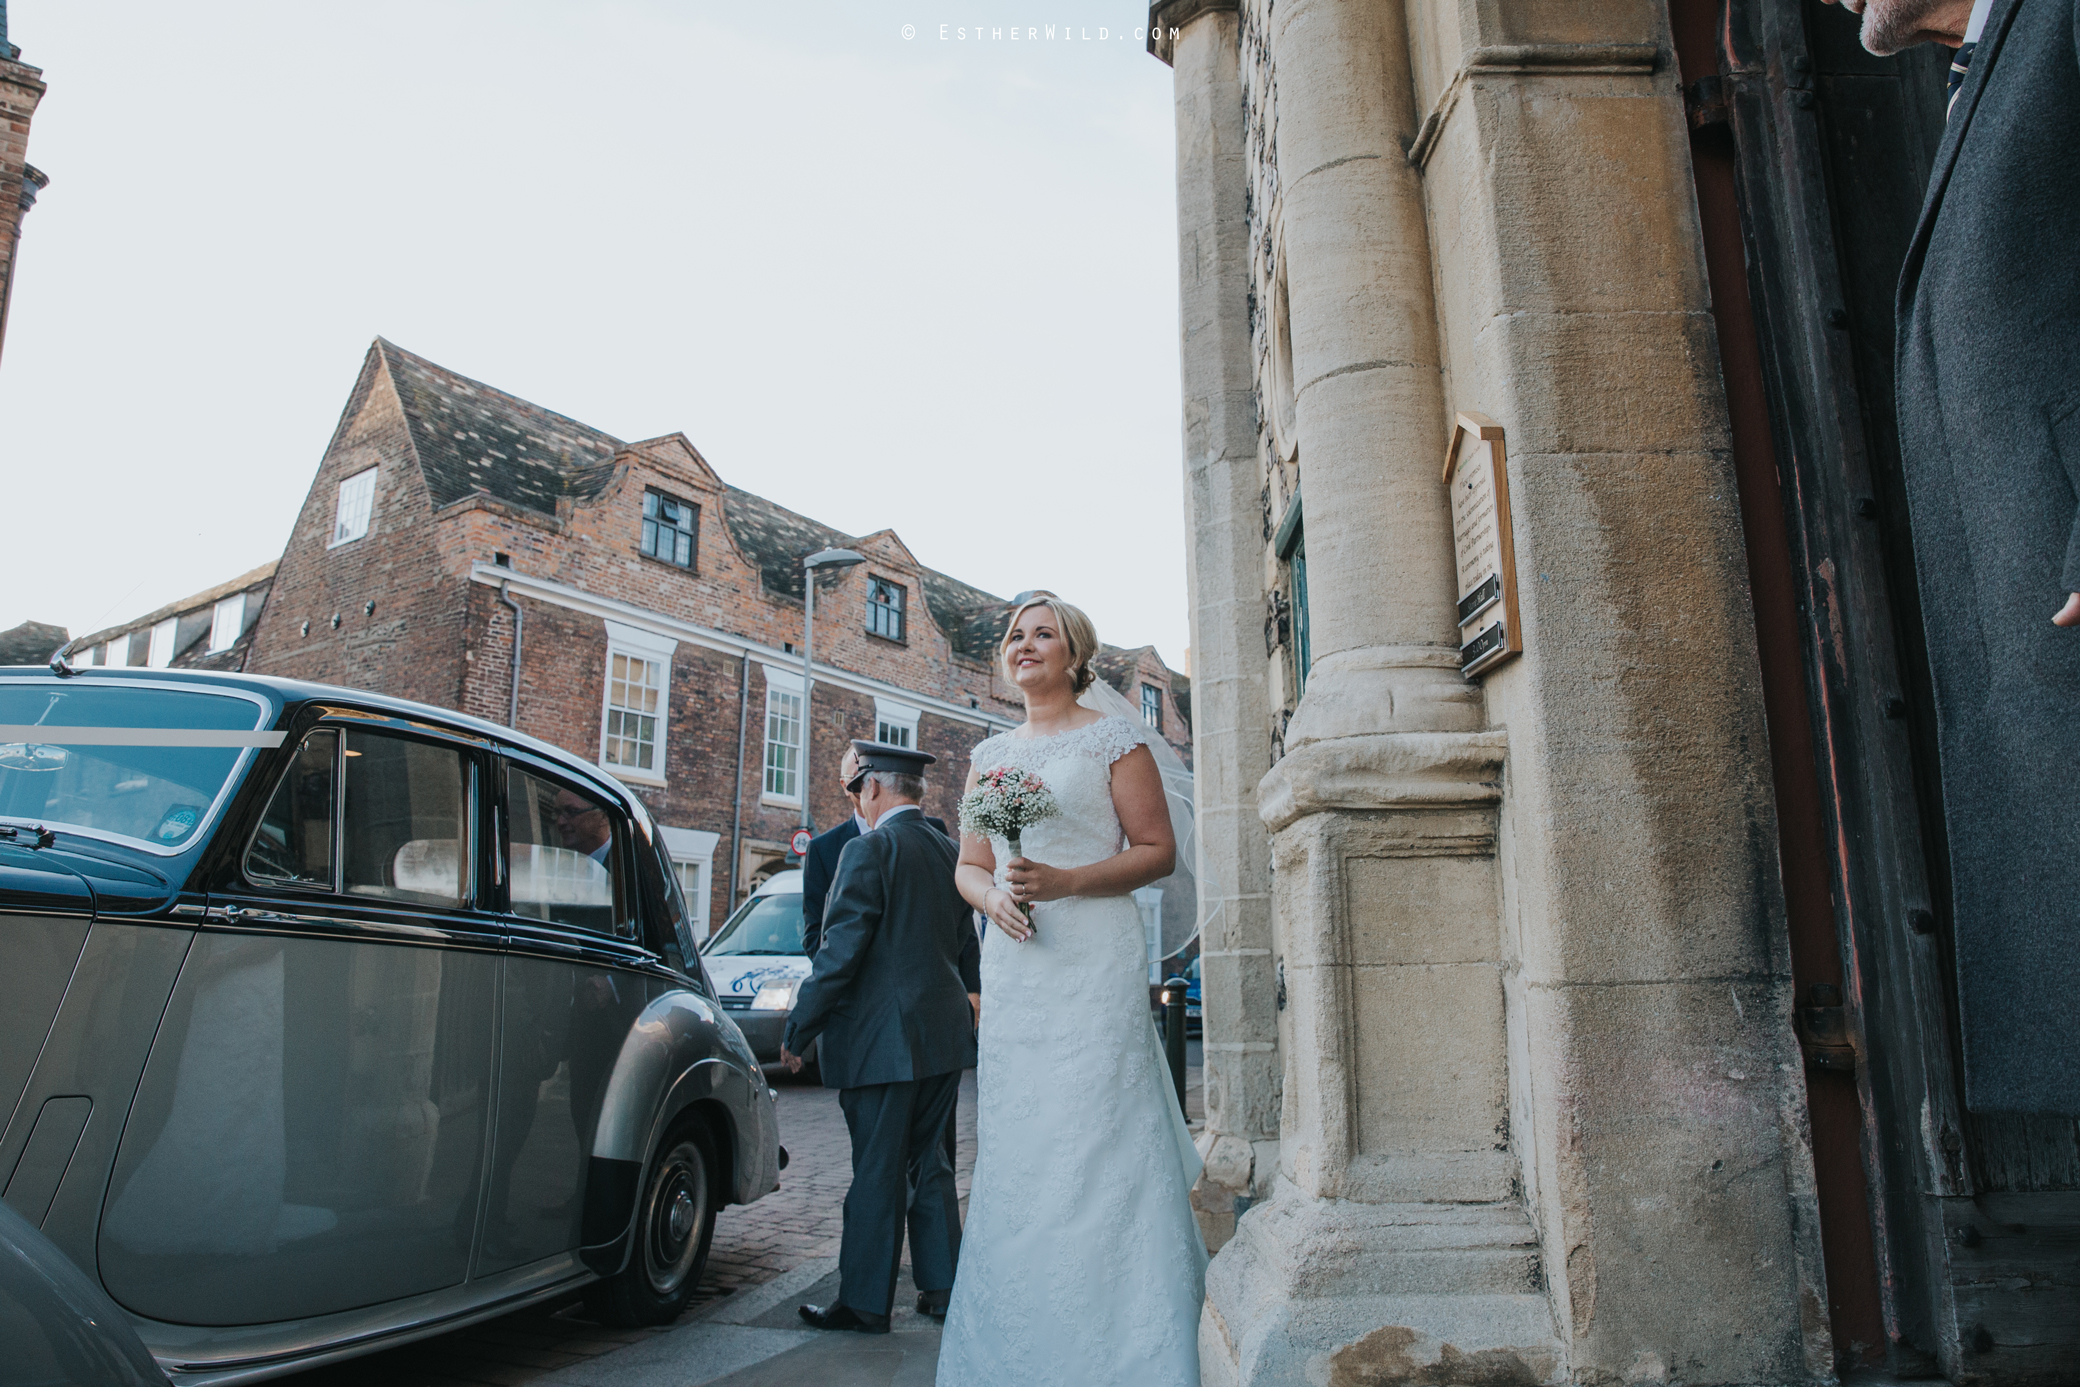 Wedding_Kings_Lynn_Town_Hall_Norfolk_Photographer_Esther_Wild_IMG_0849.jpg